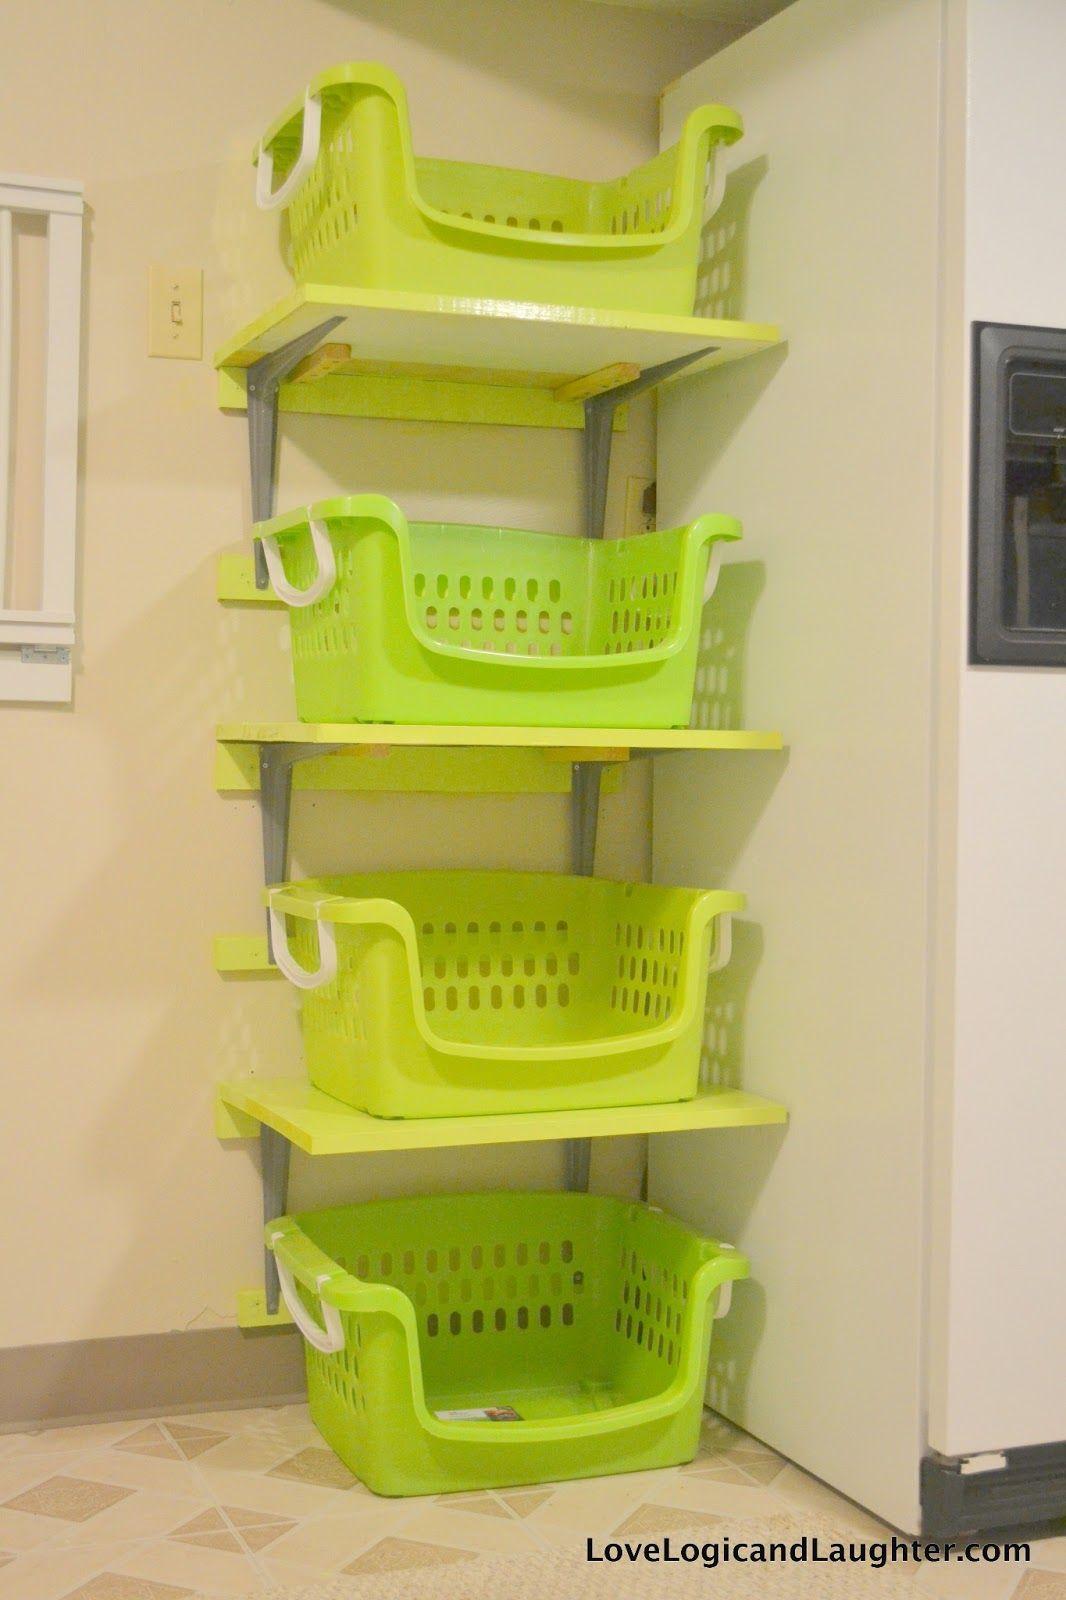 Small Laundry Basket Ideas